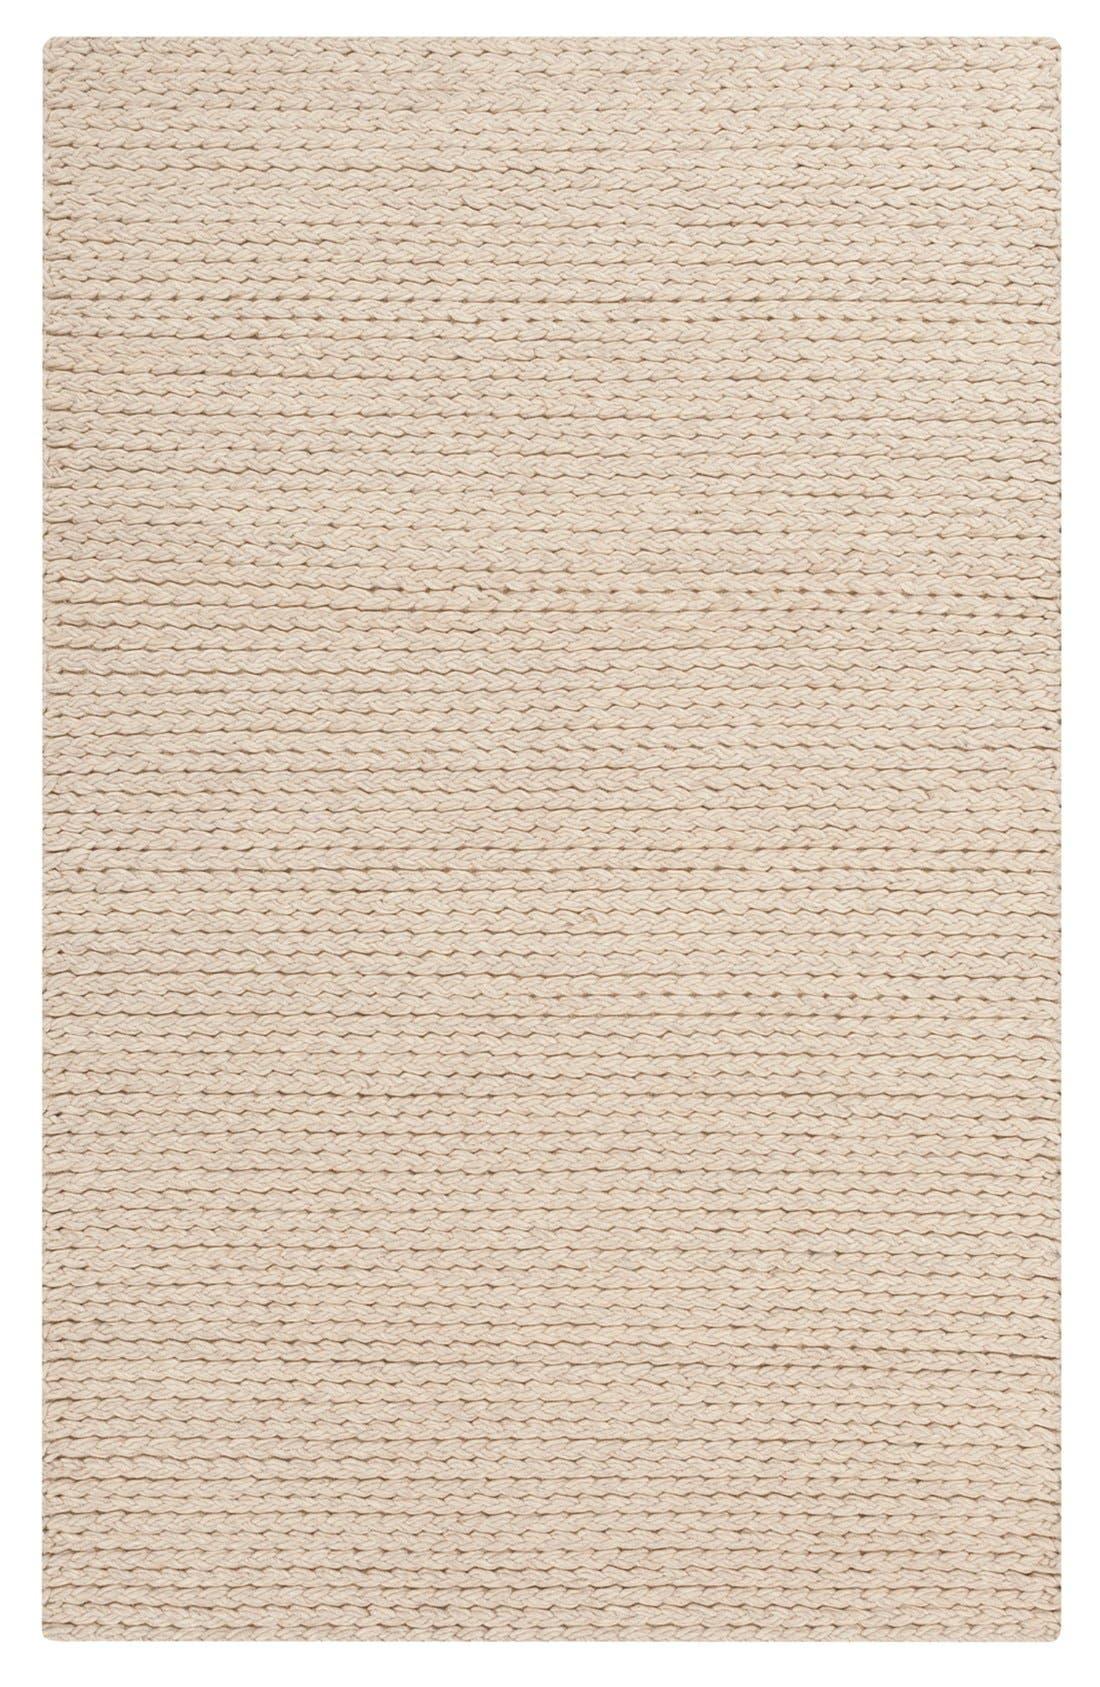 Main Image - Surya Home 'Yukon' Hand Woven Wool Rug